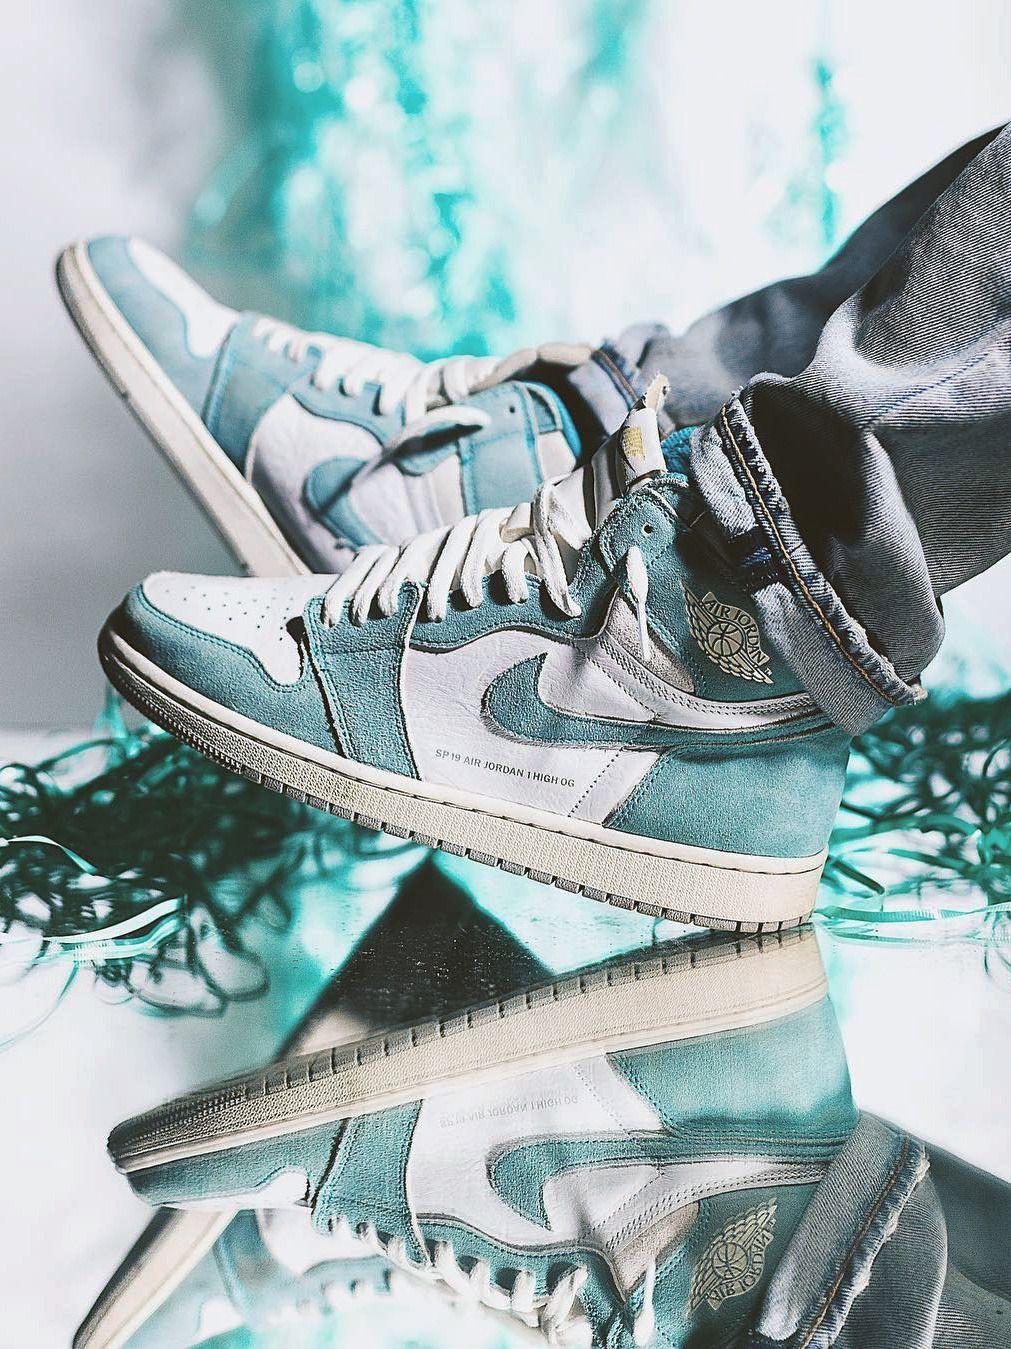 Nike Air Jordan 1 Turbo Green 2019 By Diecold Sneakers Men